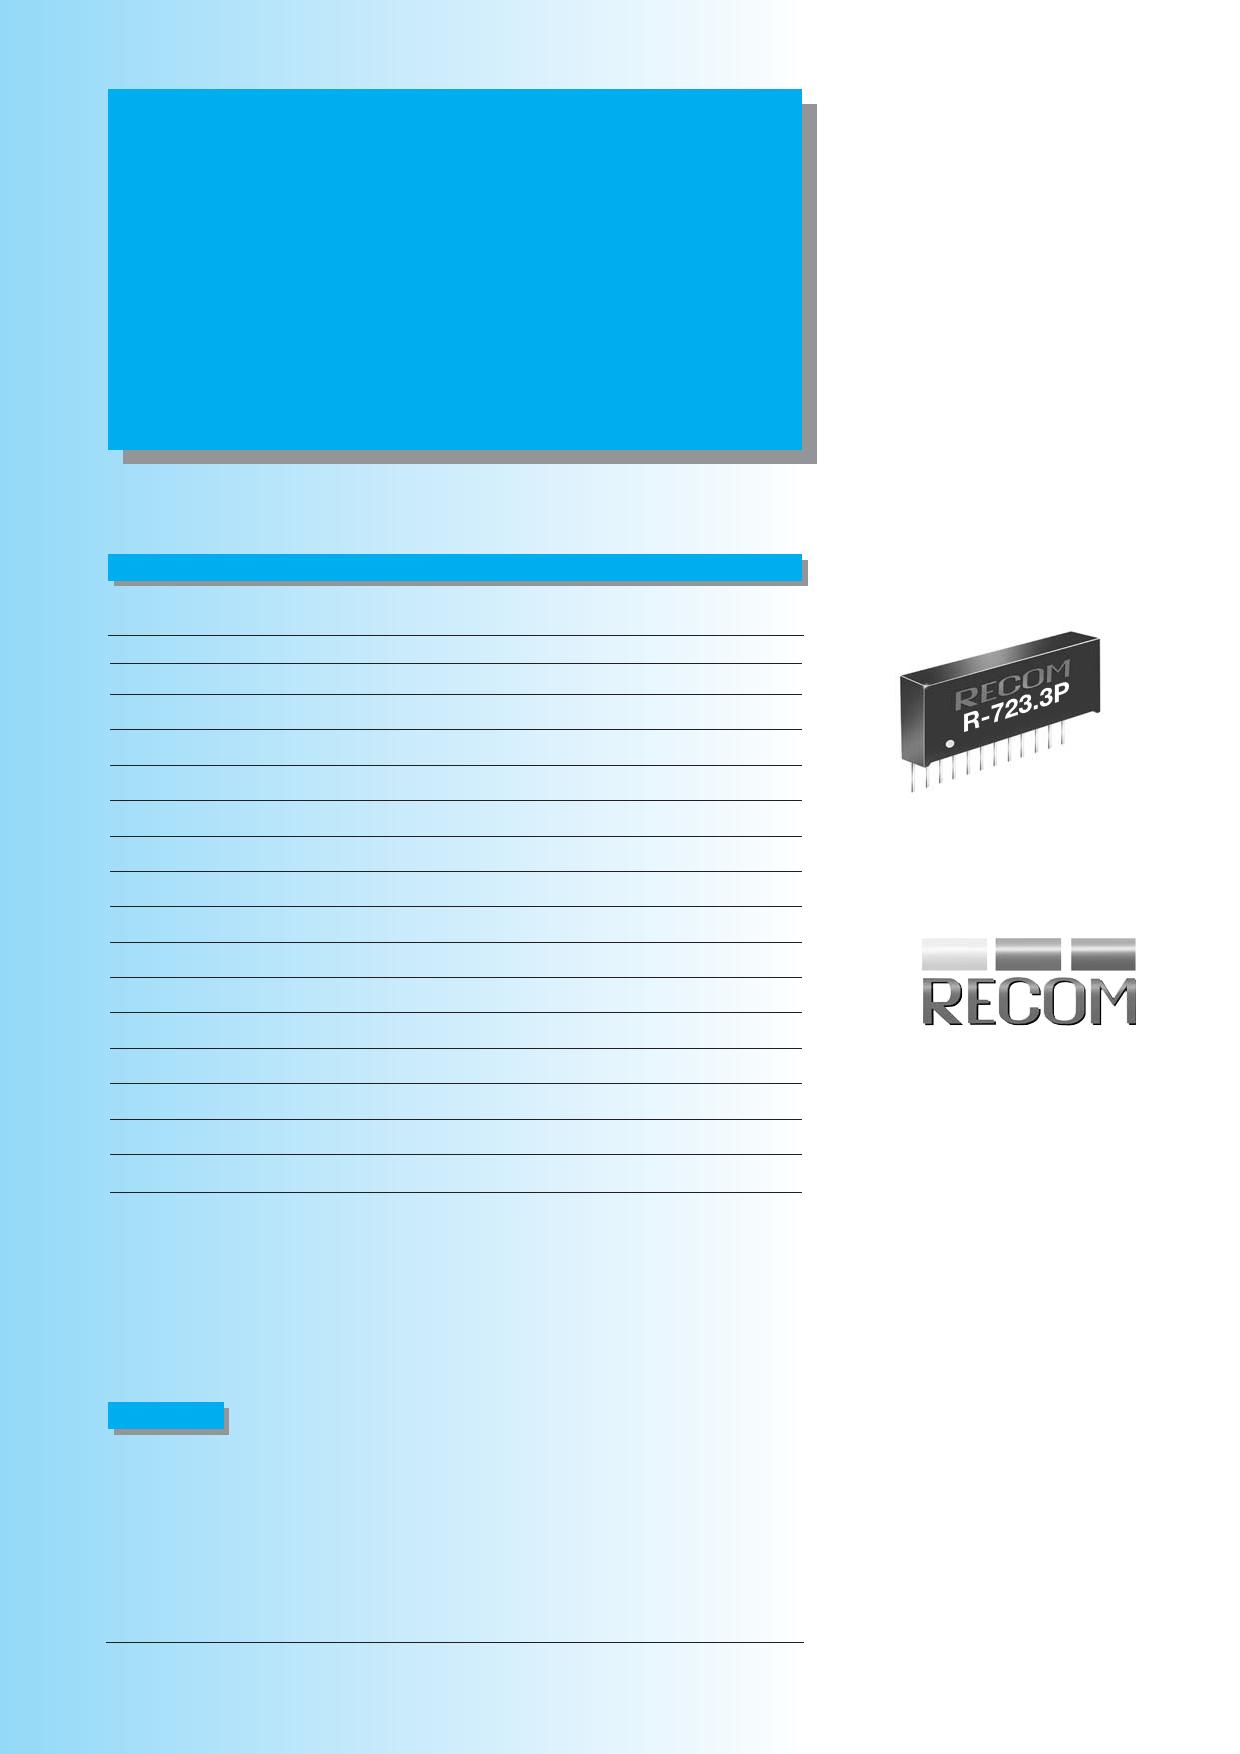 R-723.3P datasheet